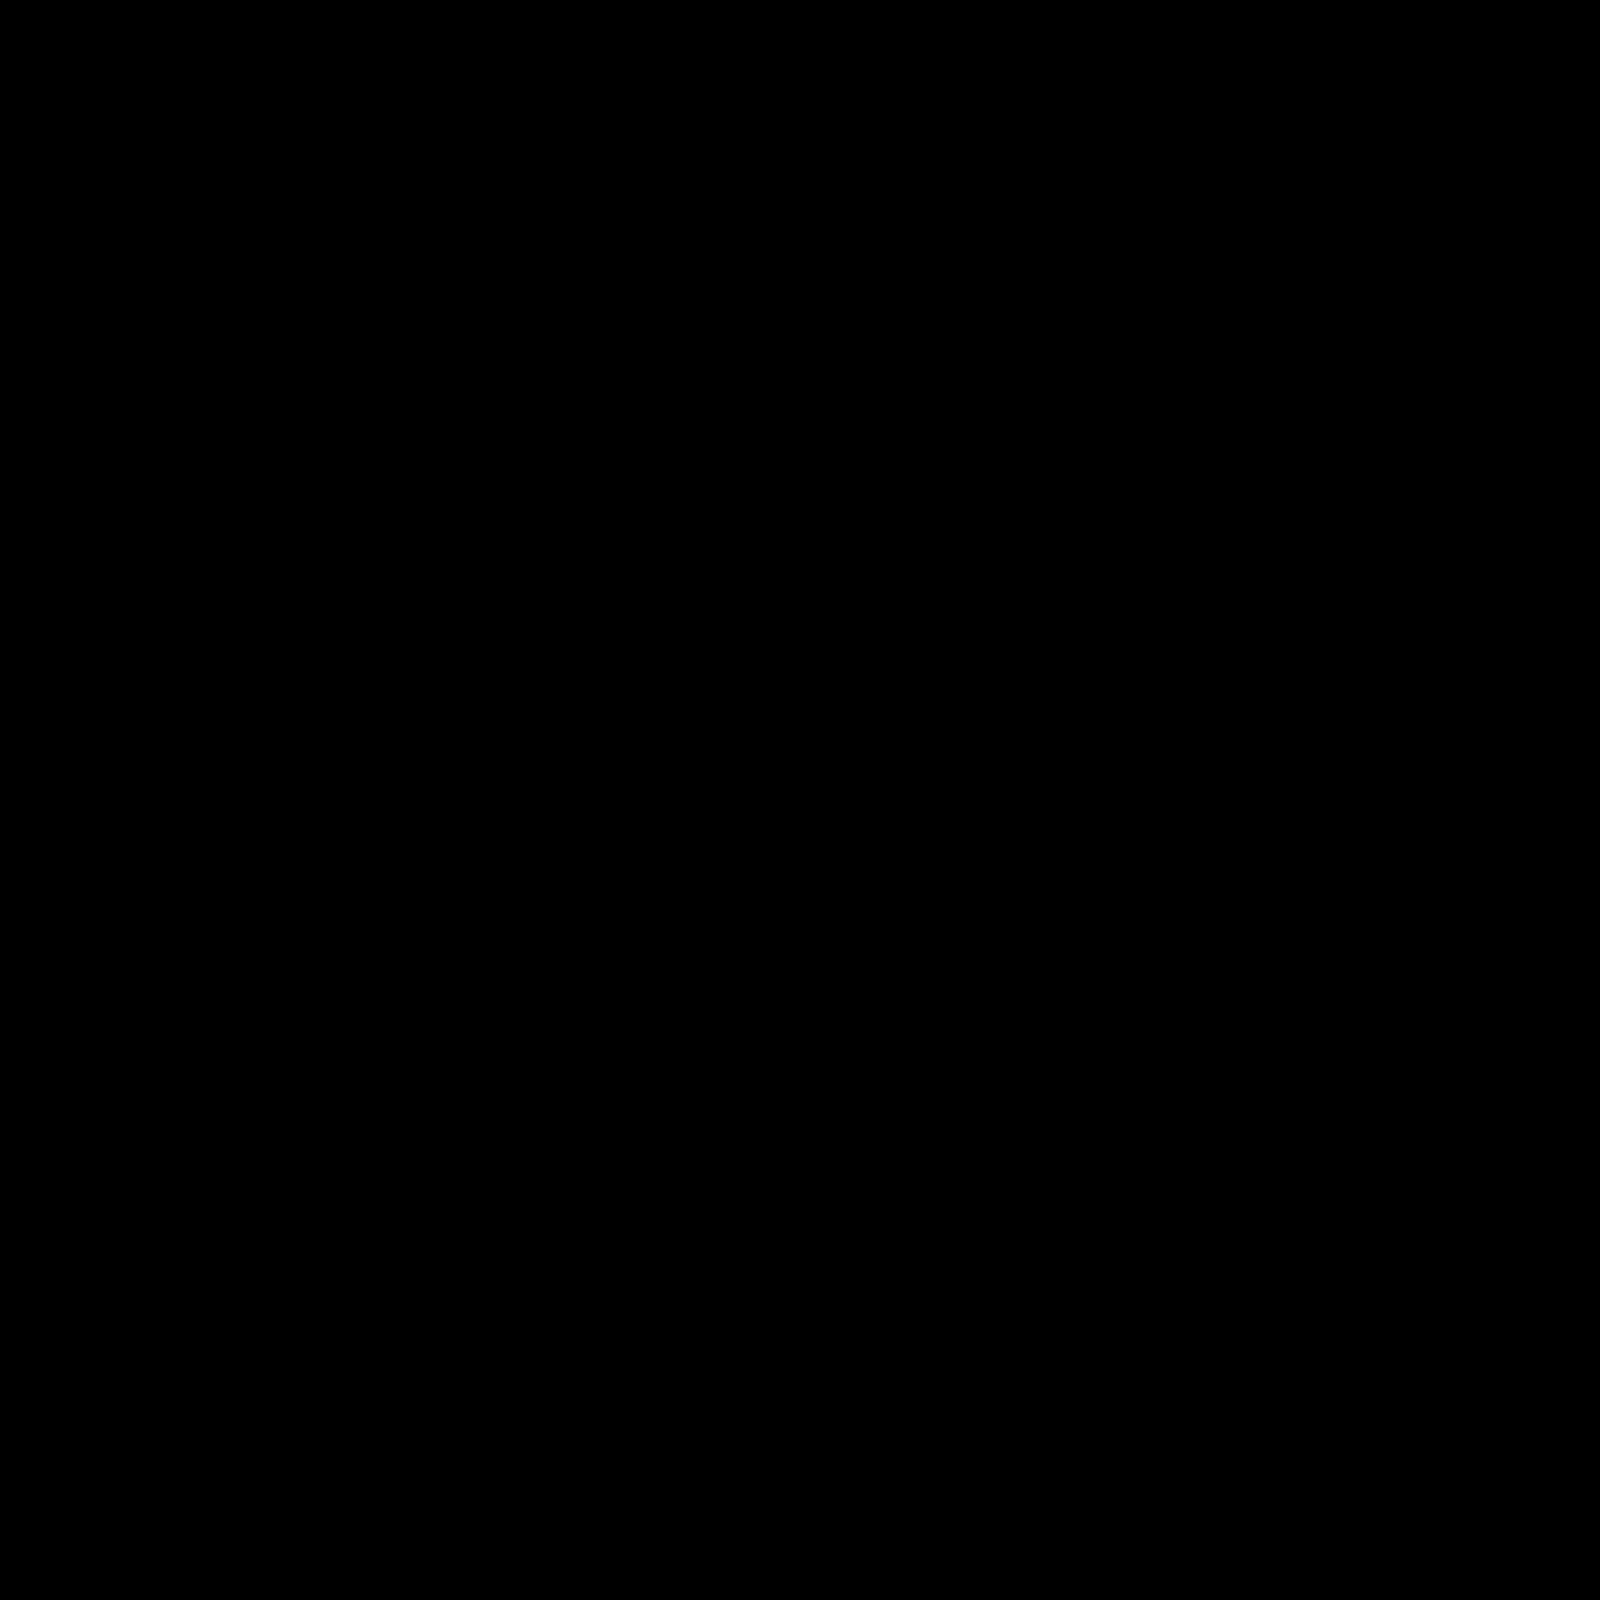 7 de diamantes icon